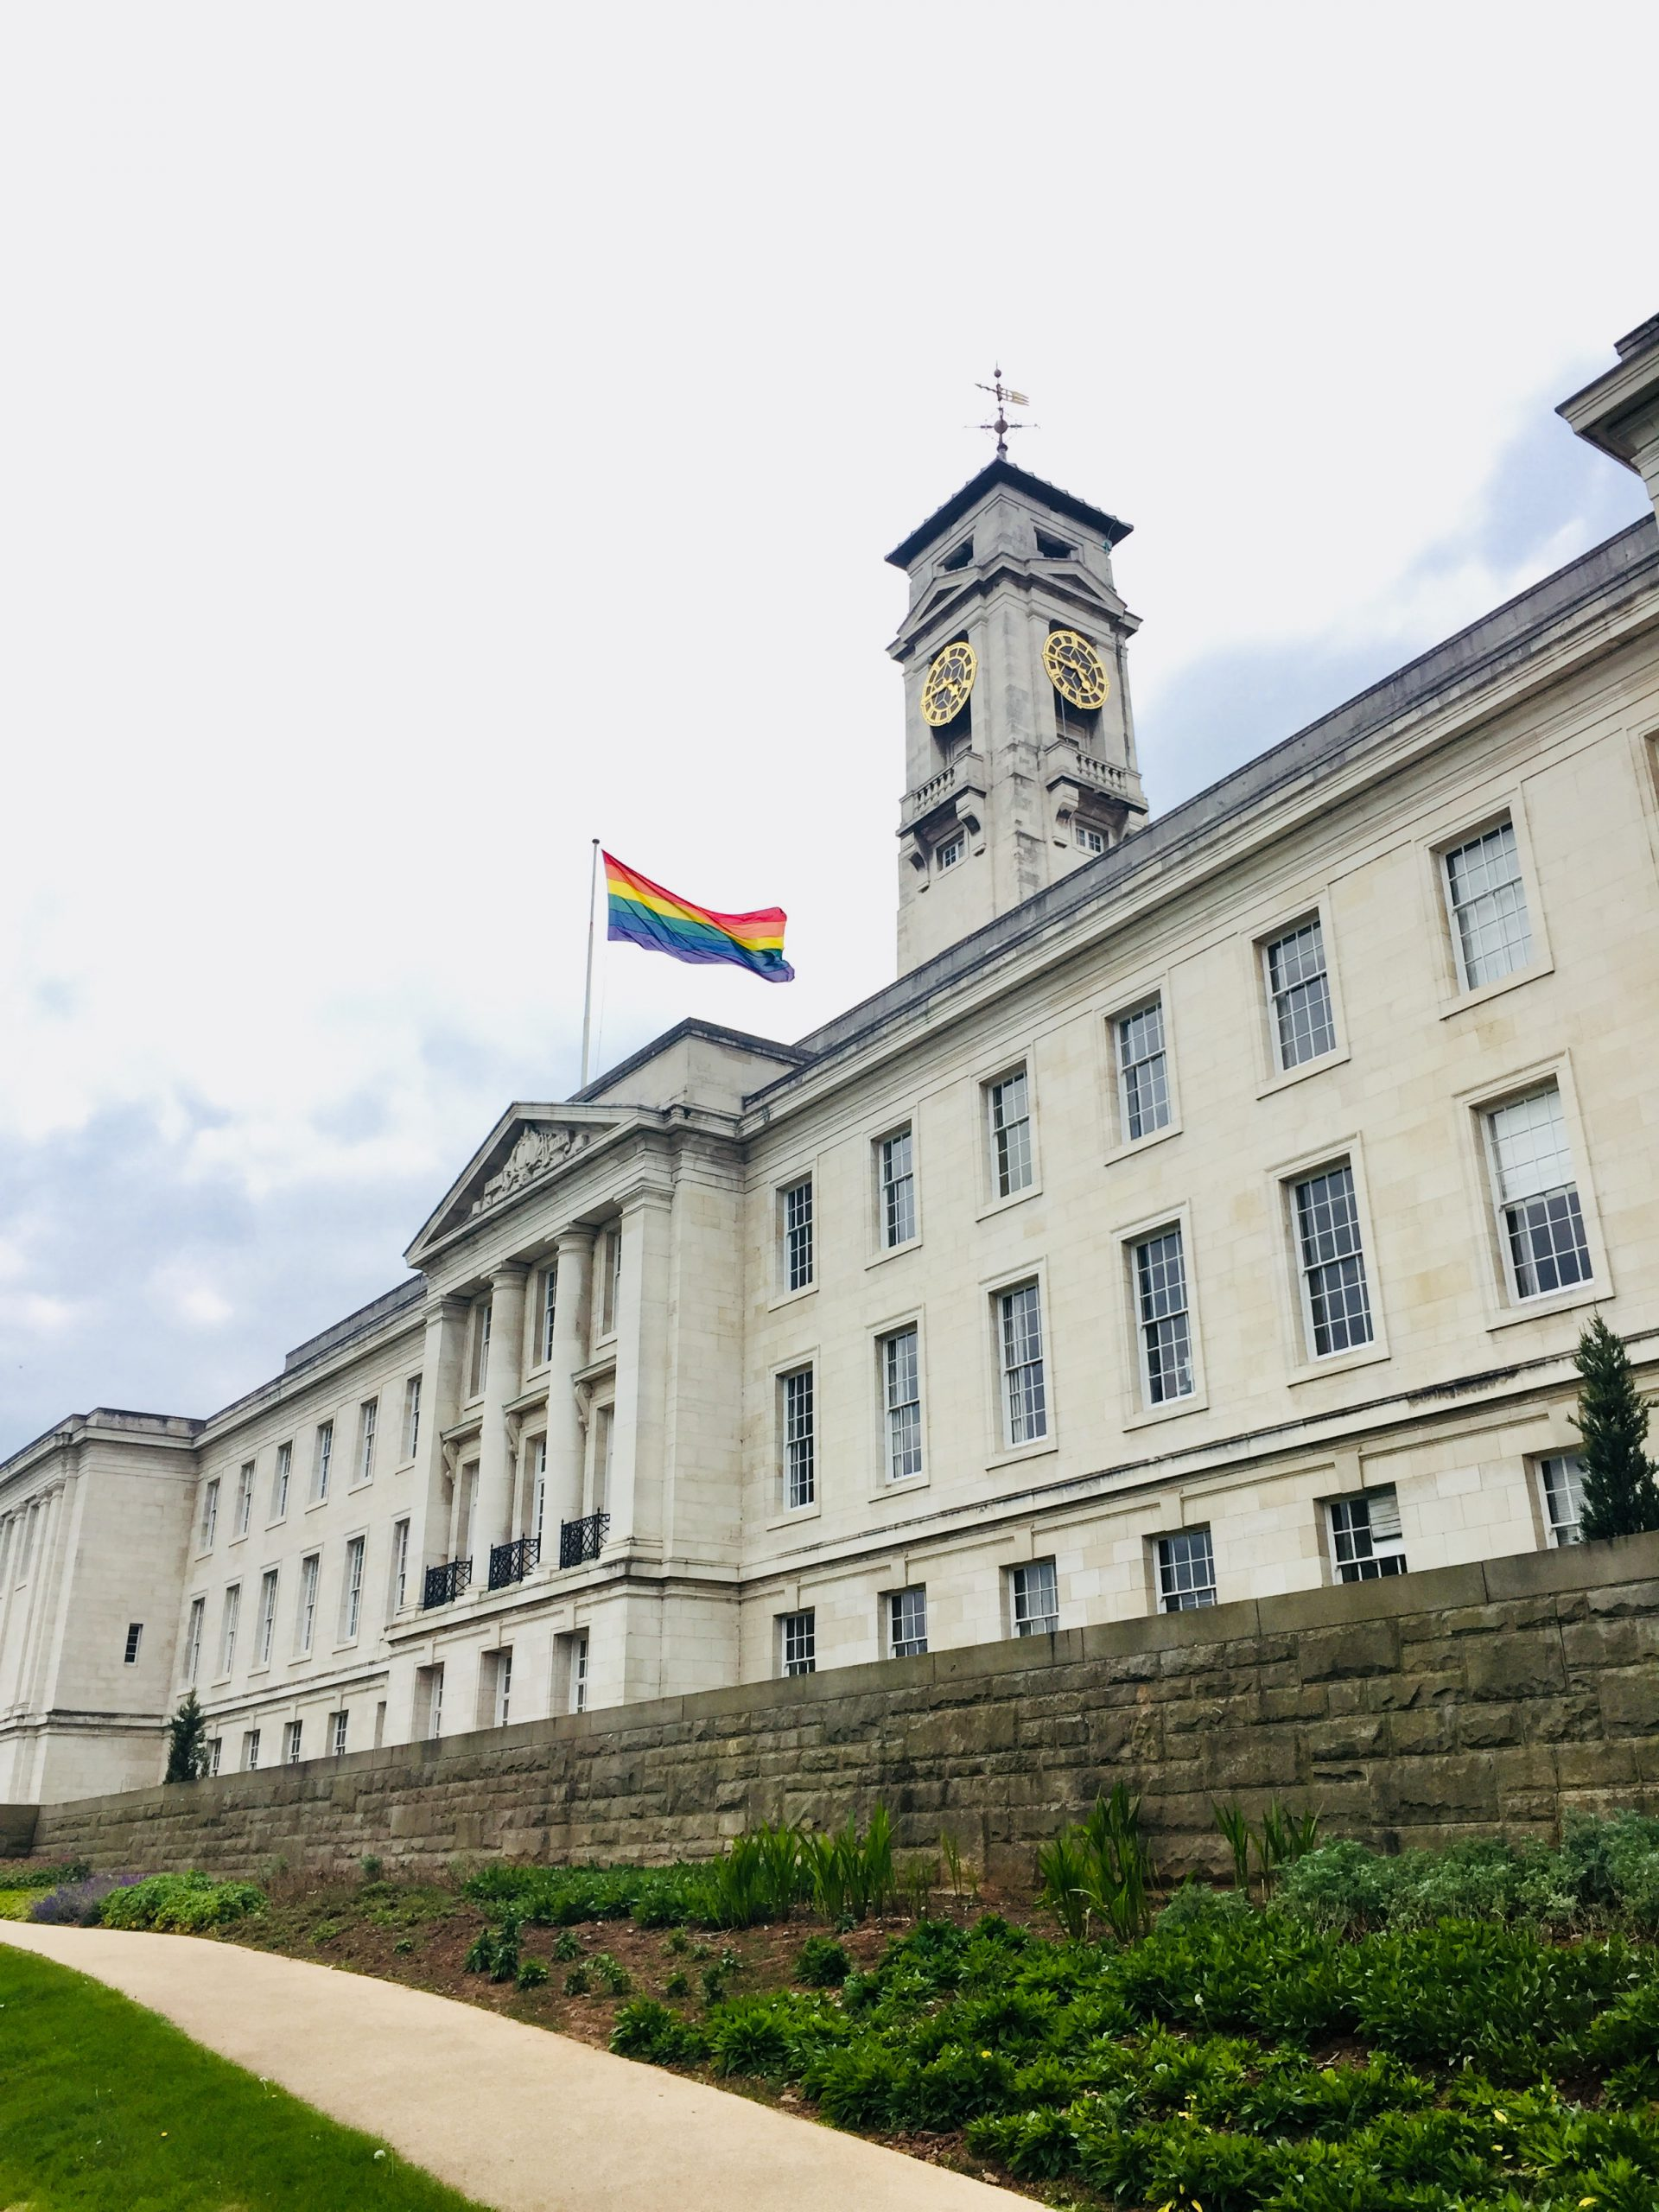 rainbow flag and nottingham uni